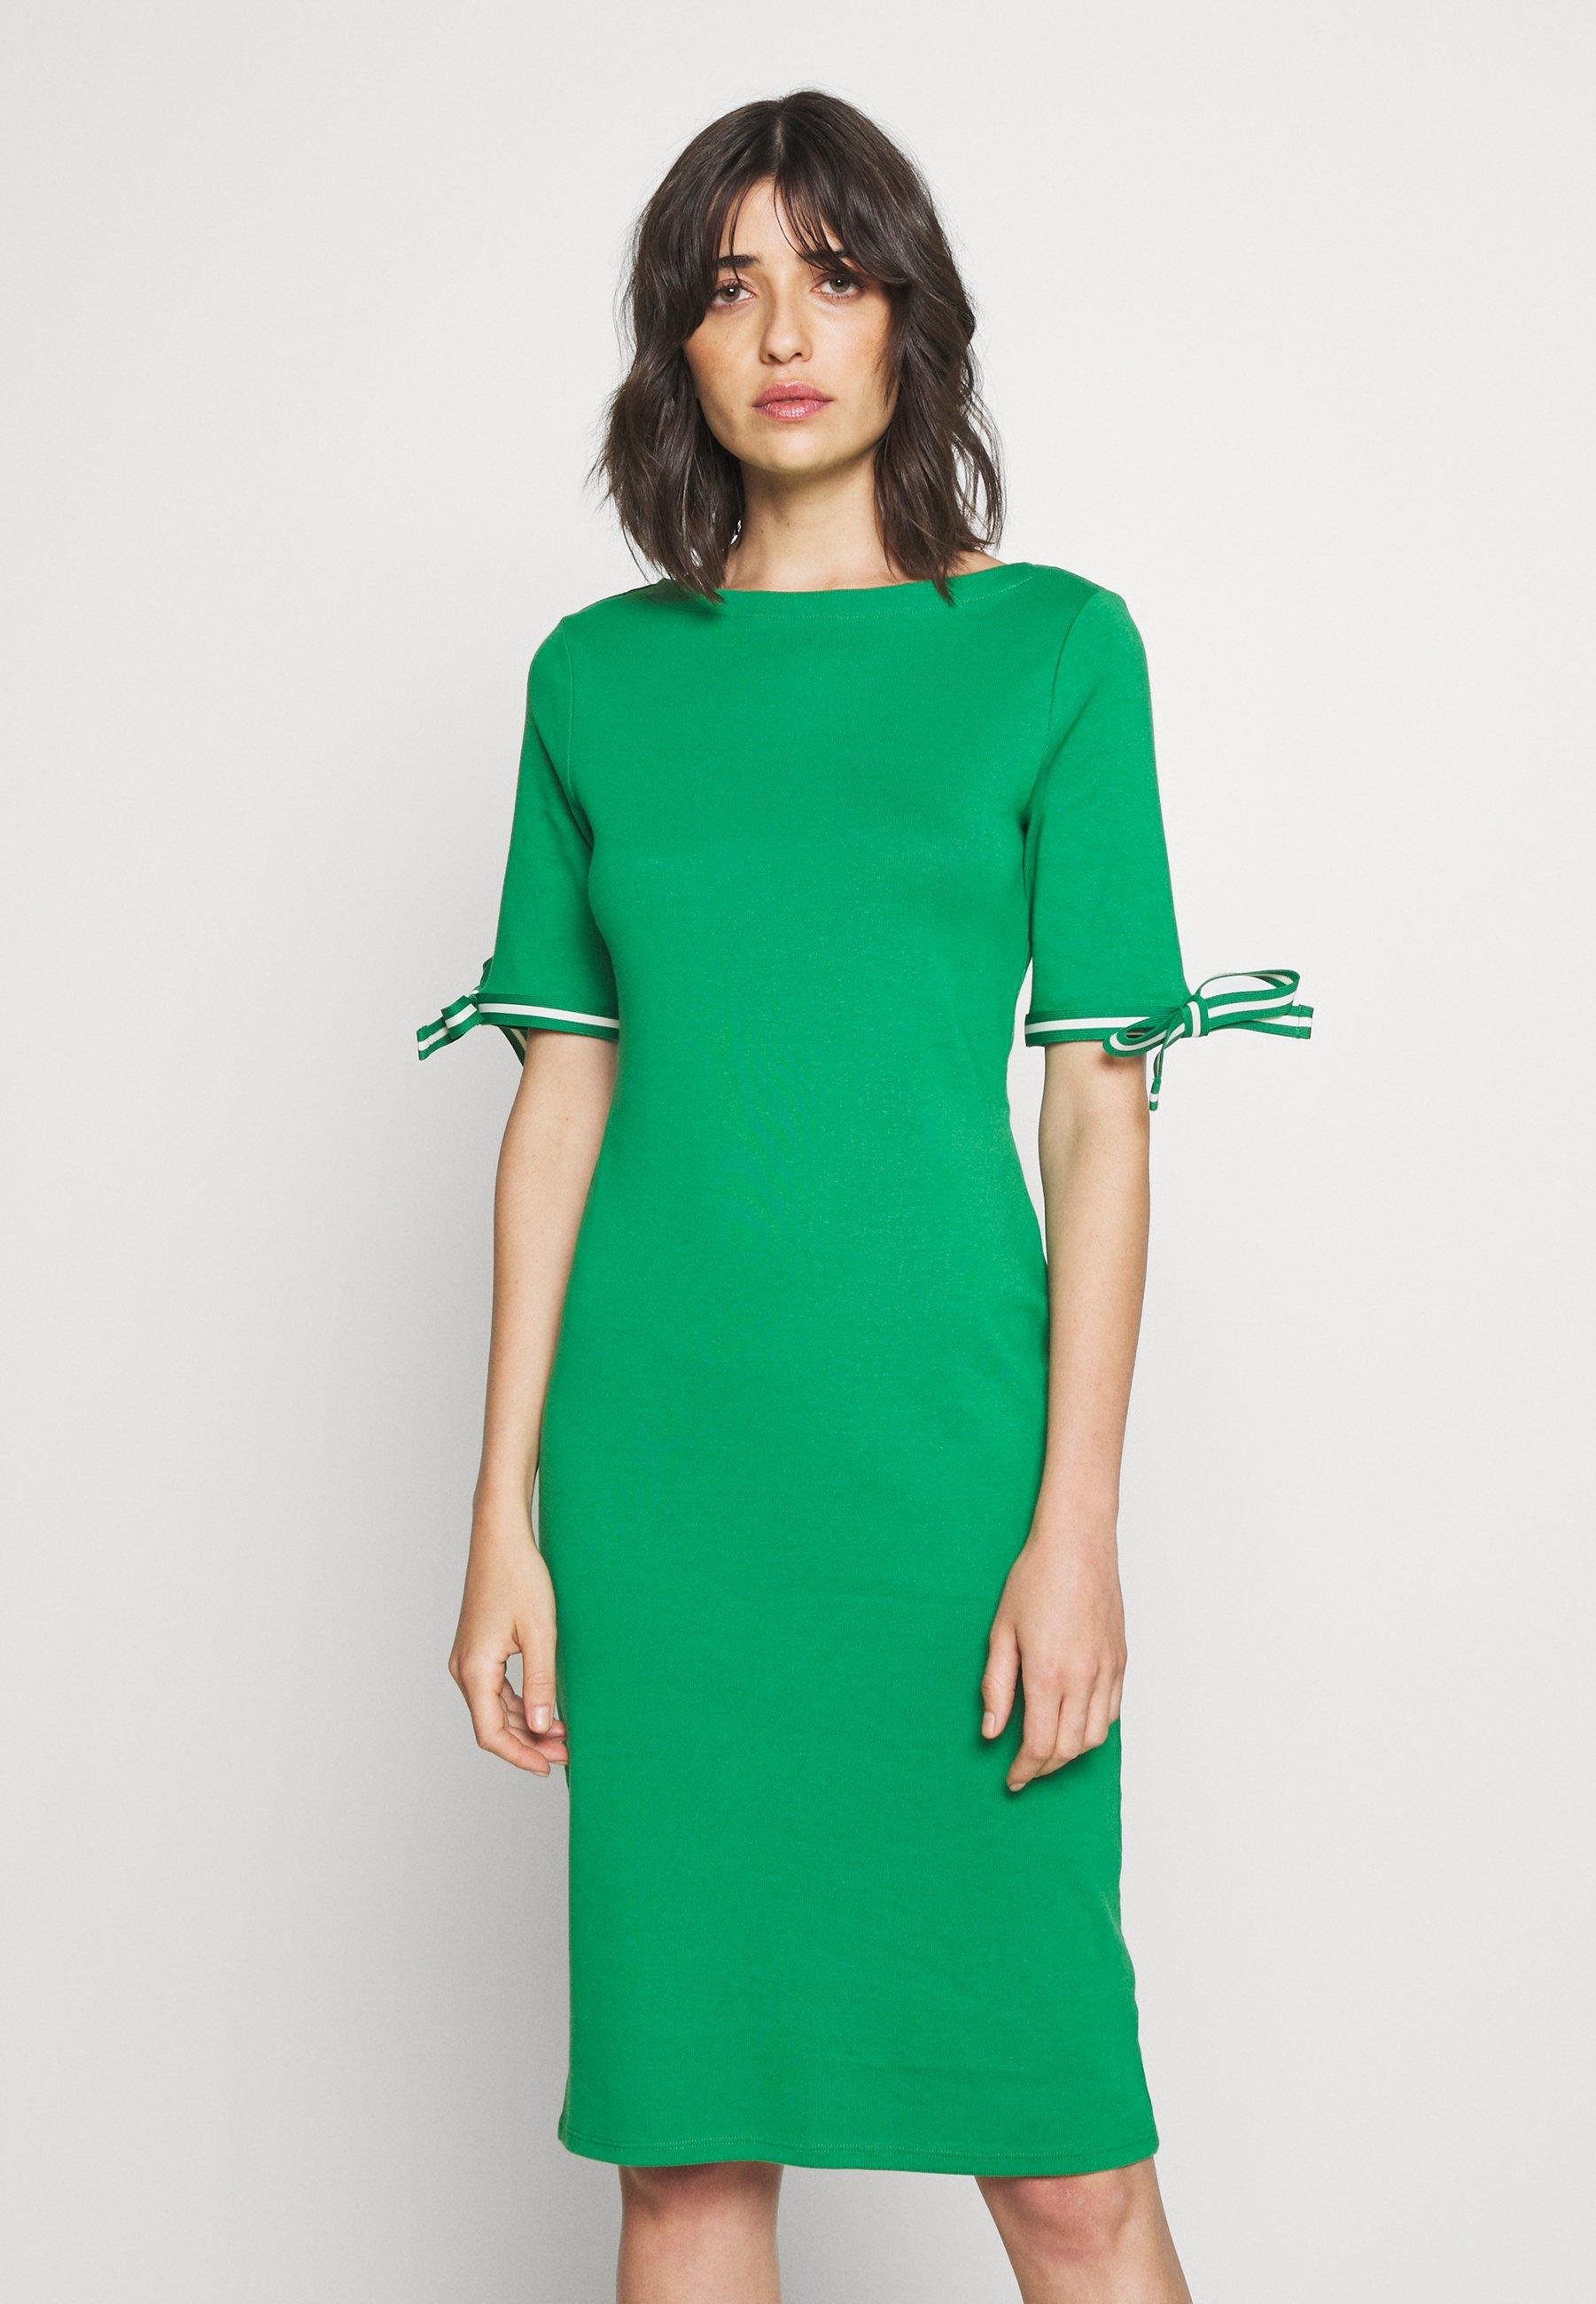 Ralph Lauren Knee Length Long Sleeve Turquoise Dress NWT $119